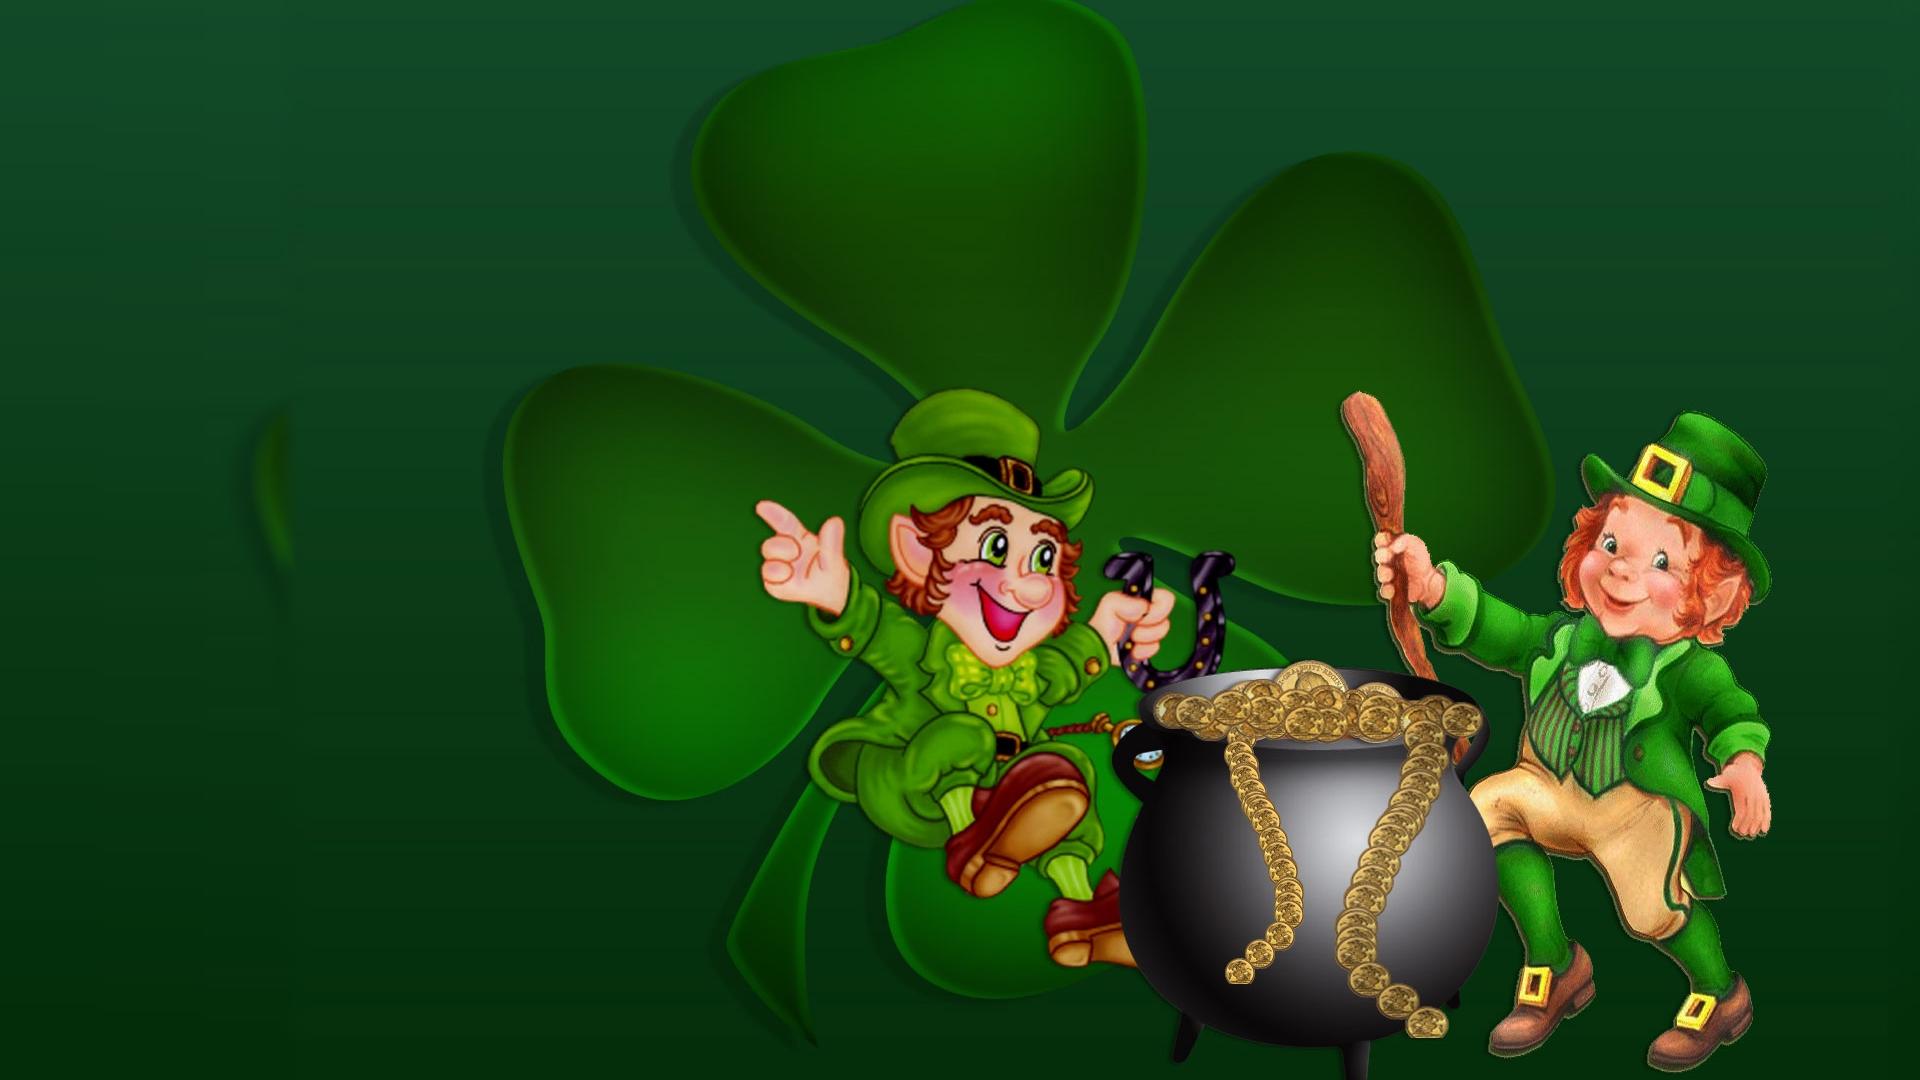 Animated St Patricks Day Wallpaper Happy saint patricks day 1920x1080